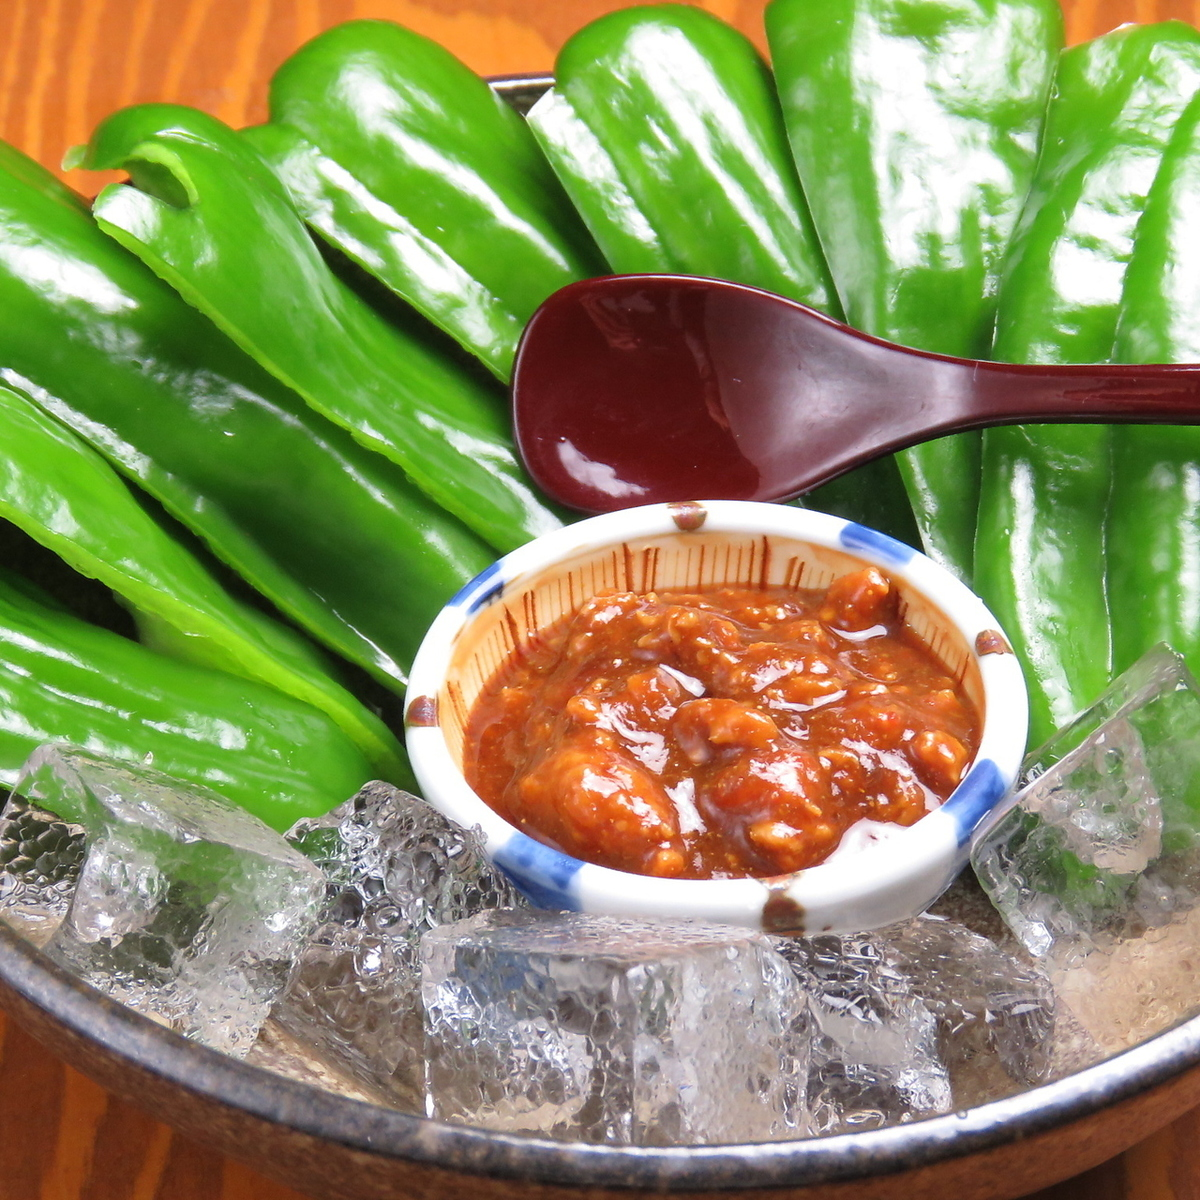 Bali Bali Meat Peppers